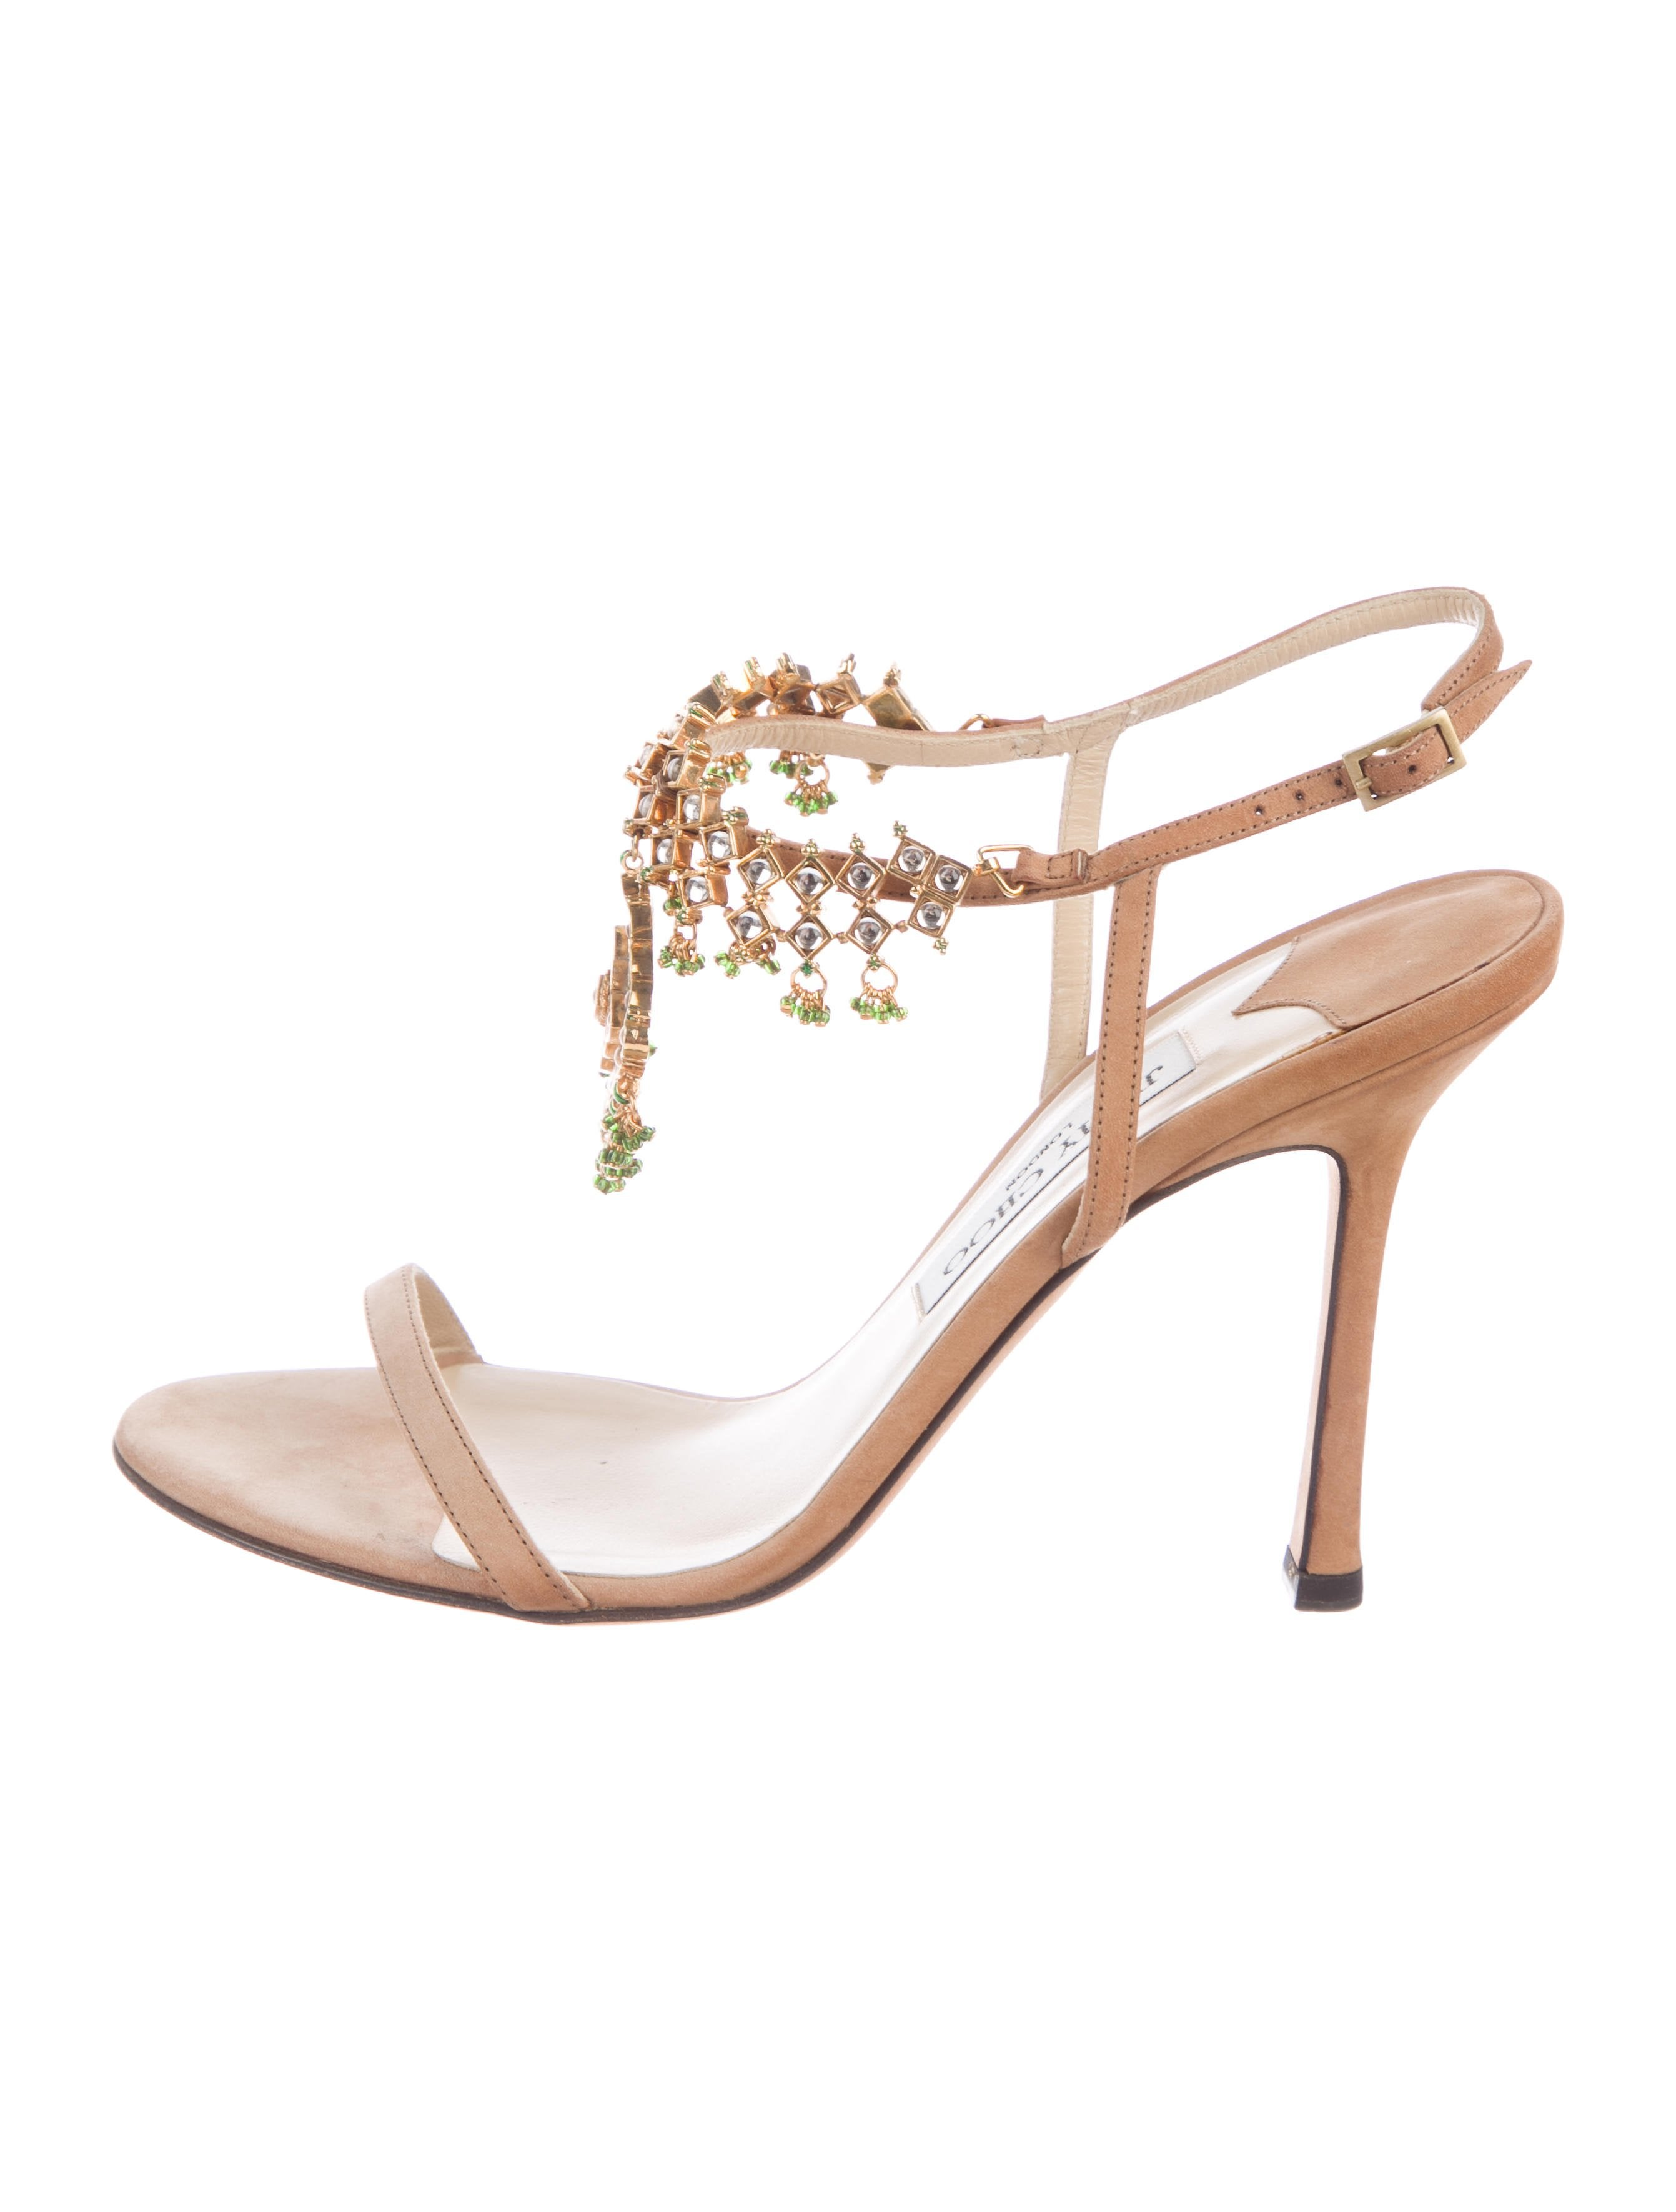 183f296b30d9b4 Jimmy Choo Siam Embellished Sandals - Shoes - JIM100285